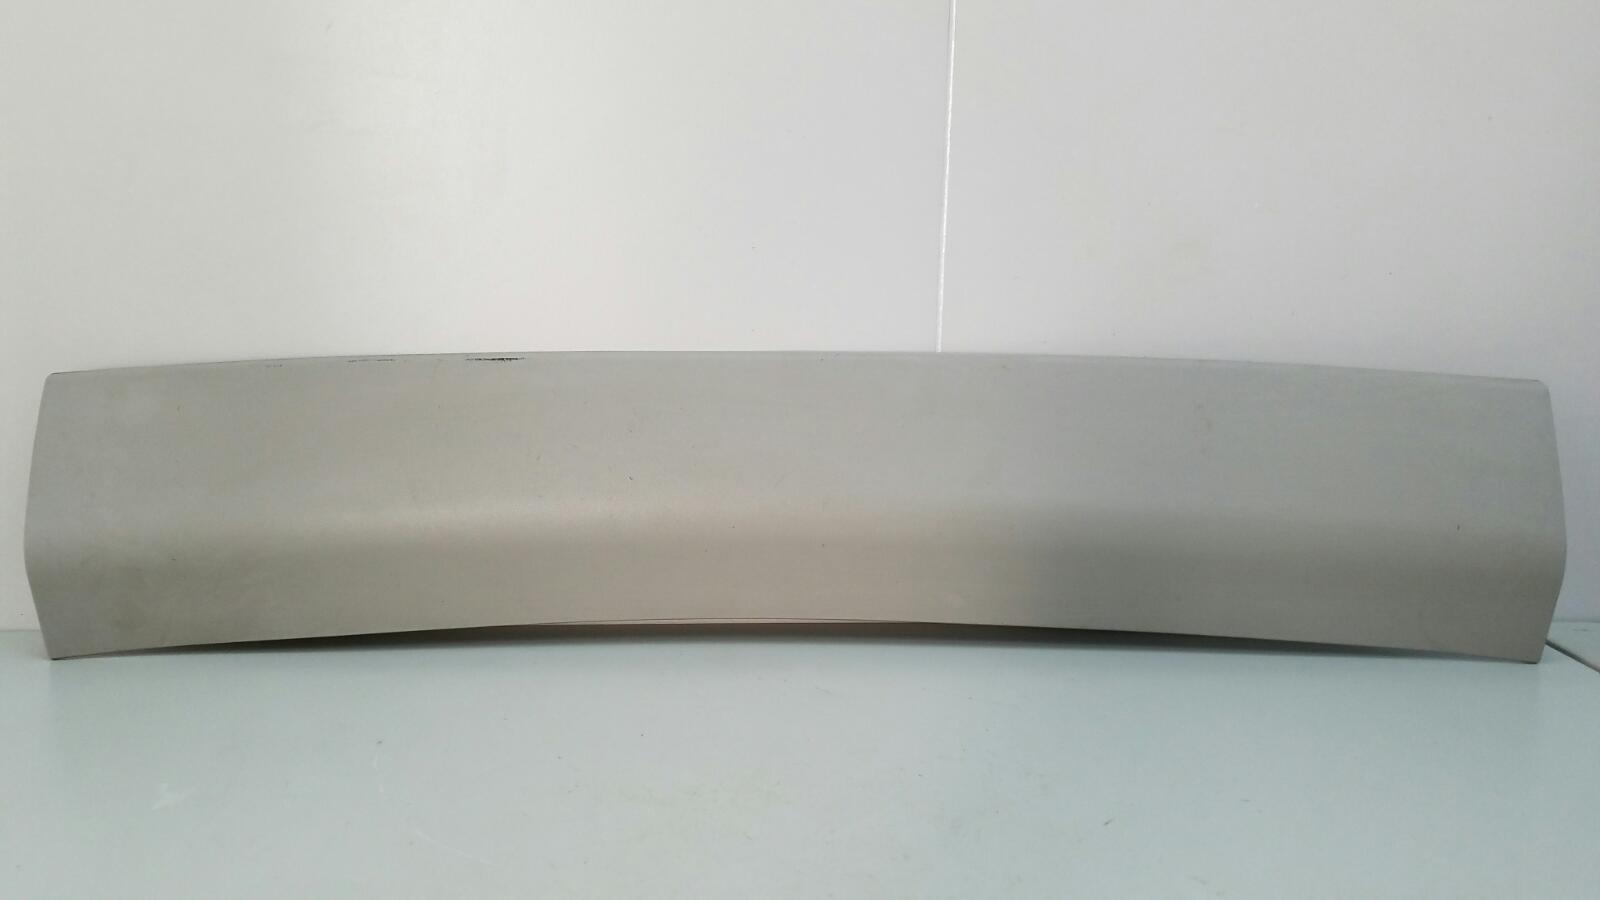 Накладка декоративная Mercedes A140 W168 M166.940 1.4Л 1999г